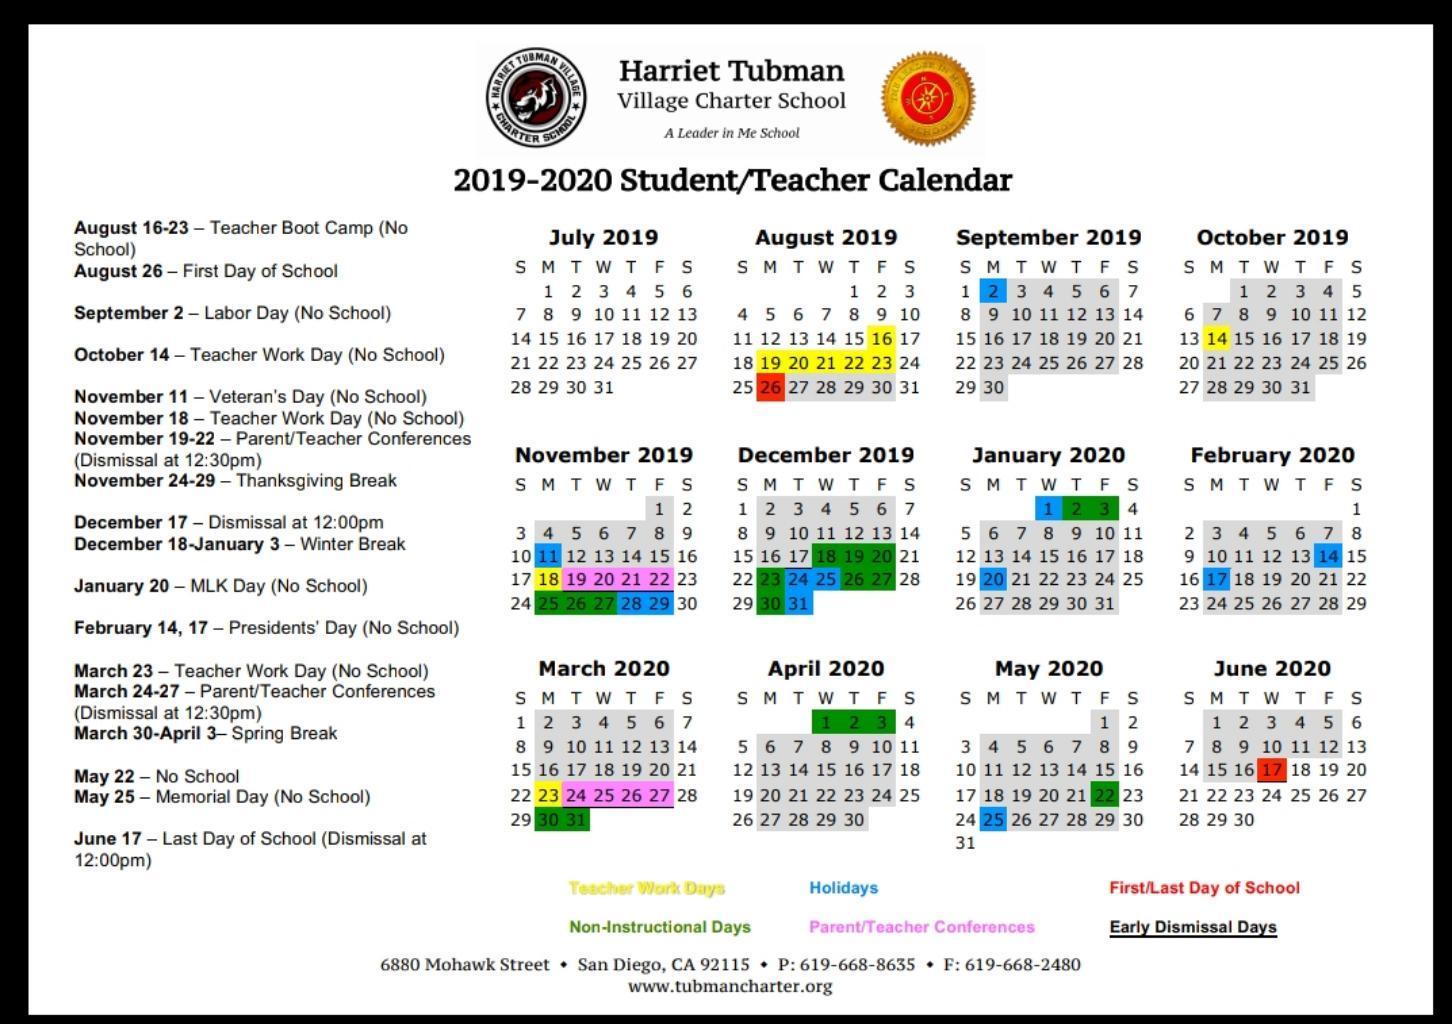 School Year Calendar 2019 16 School Year Calendar 2019 20 – School Year Calendar 2019 20